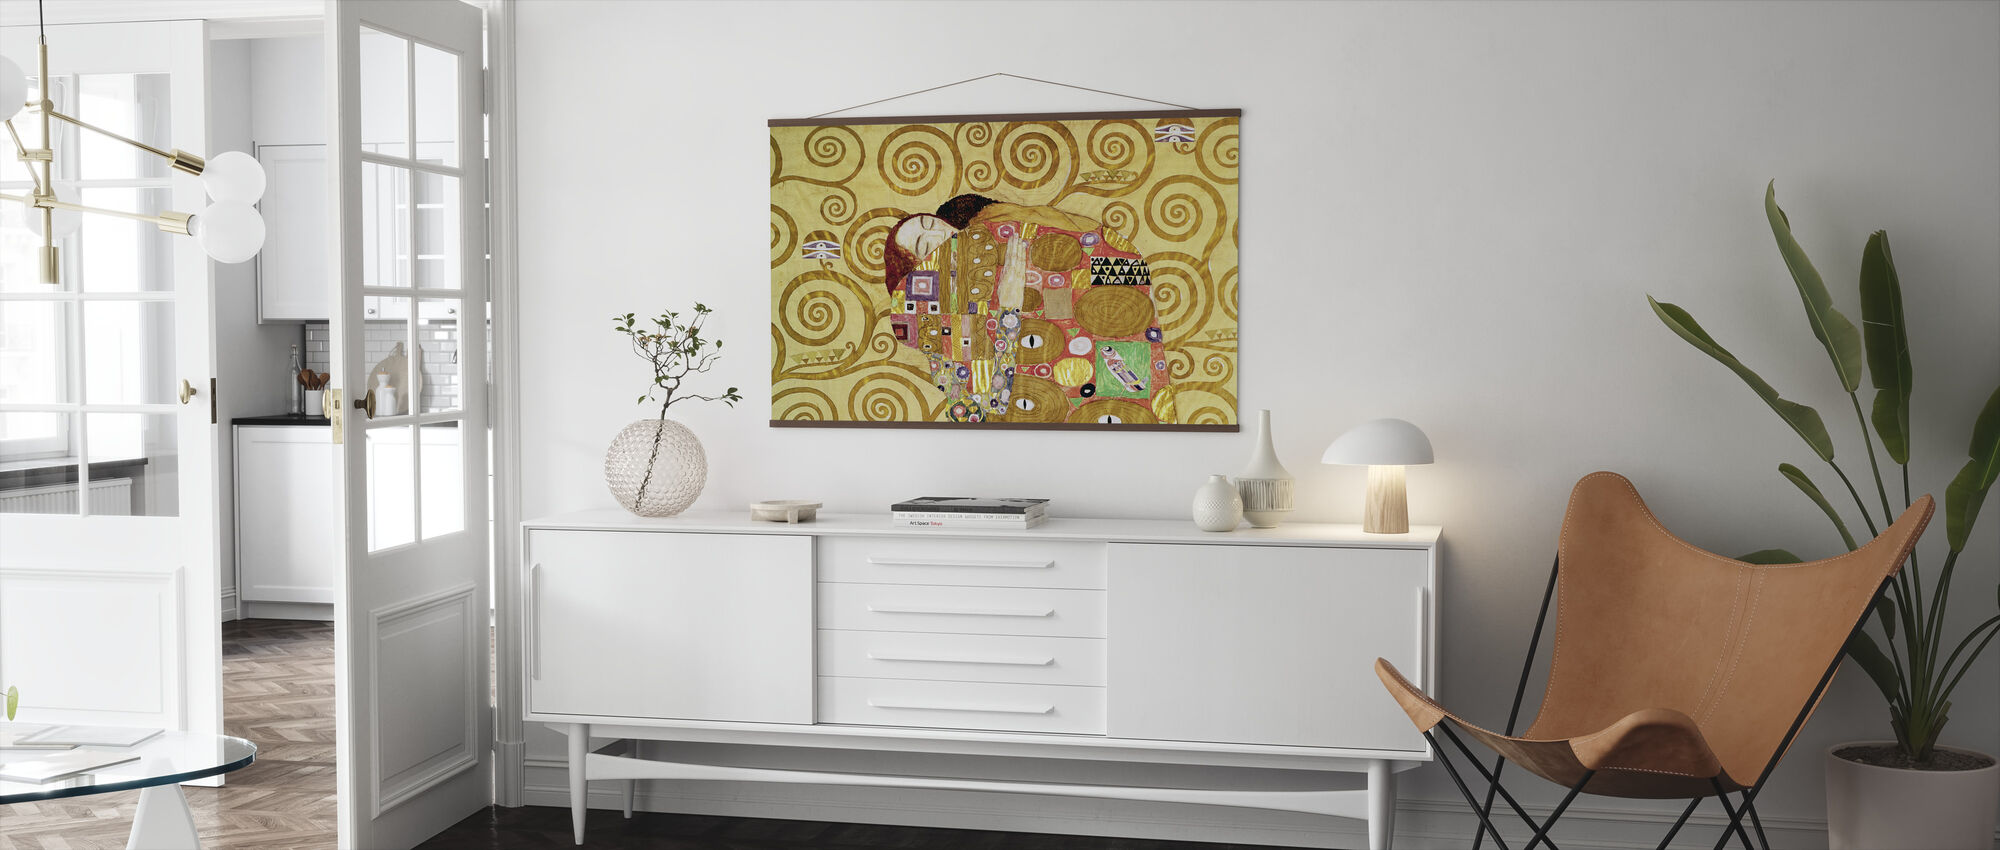 Vervulling - Gustav Klimt - Poster - Woonkamer